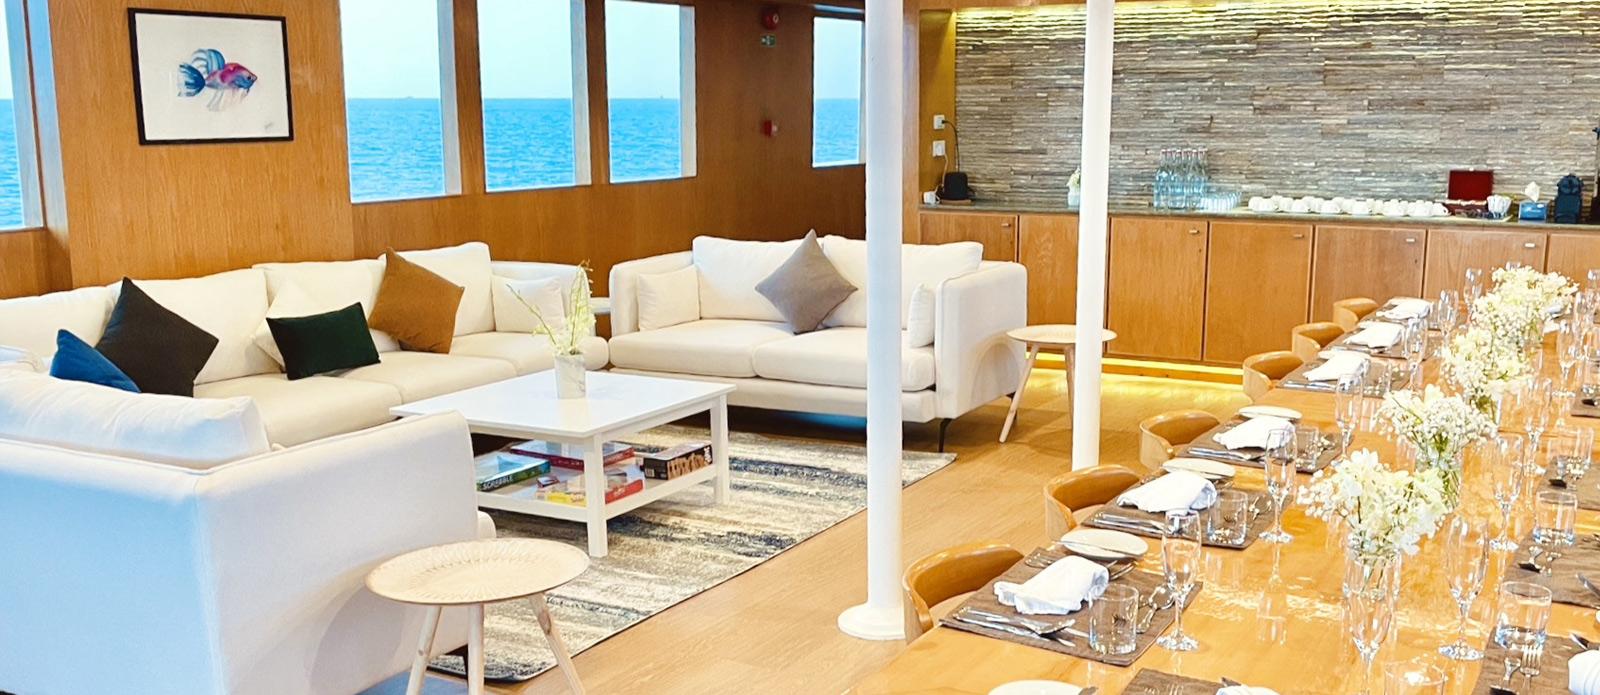 Safira-Luxury-Yacht-For-Sale-Interior-2